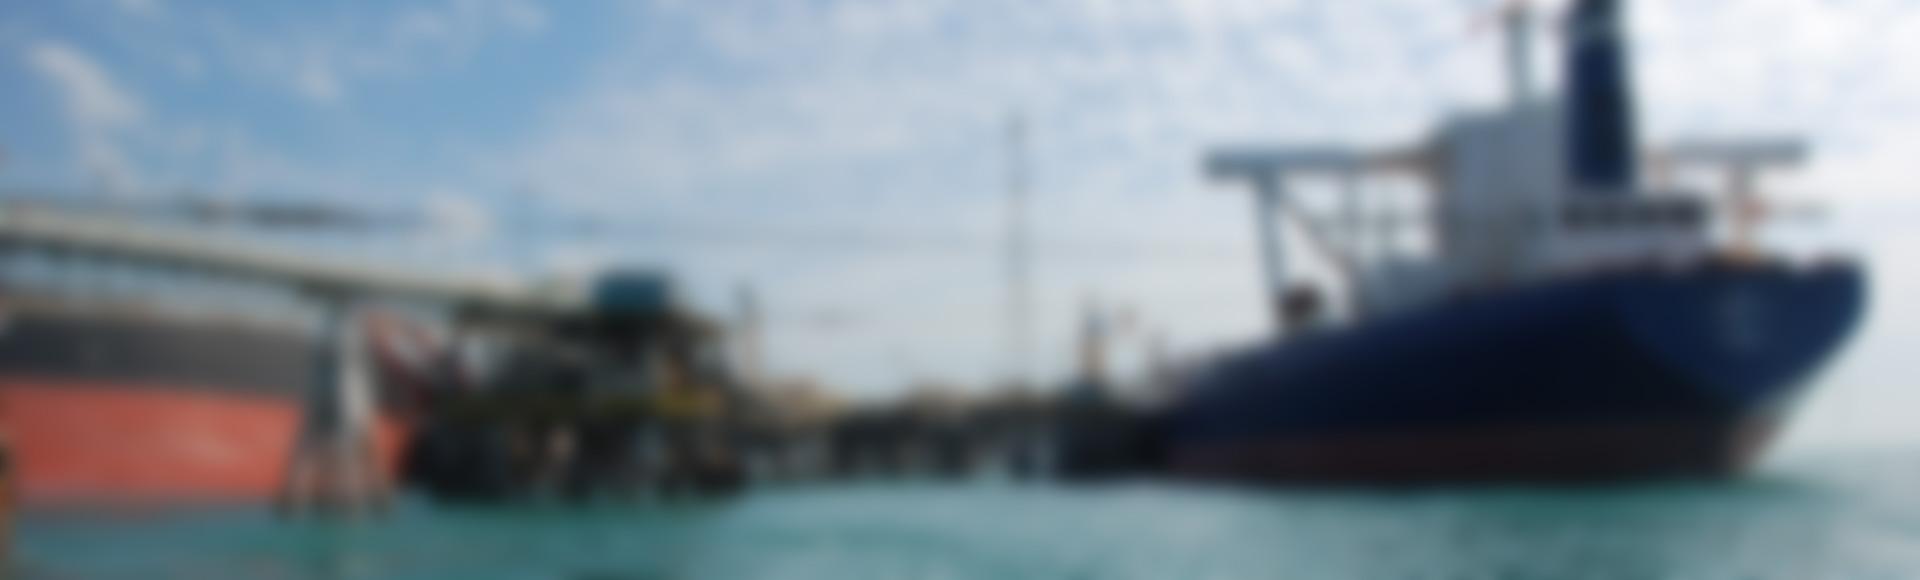 maritime-003-blured